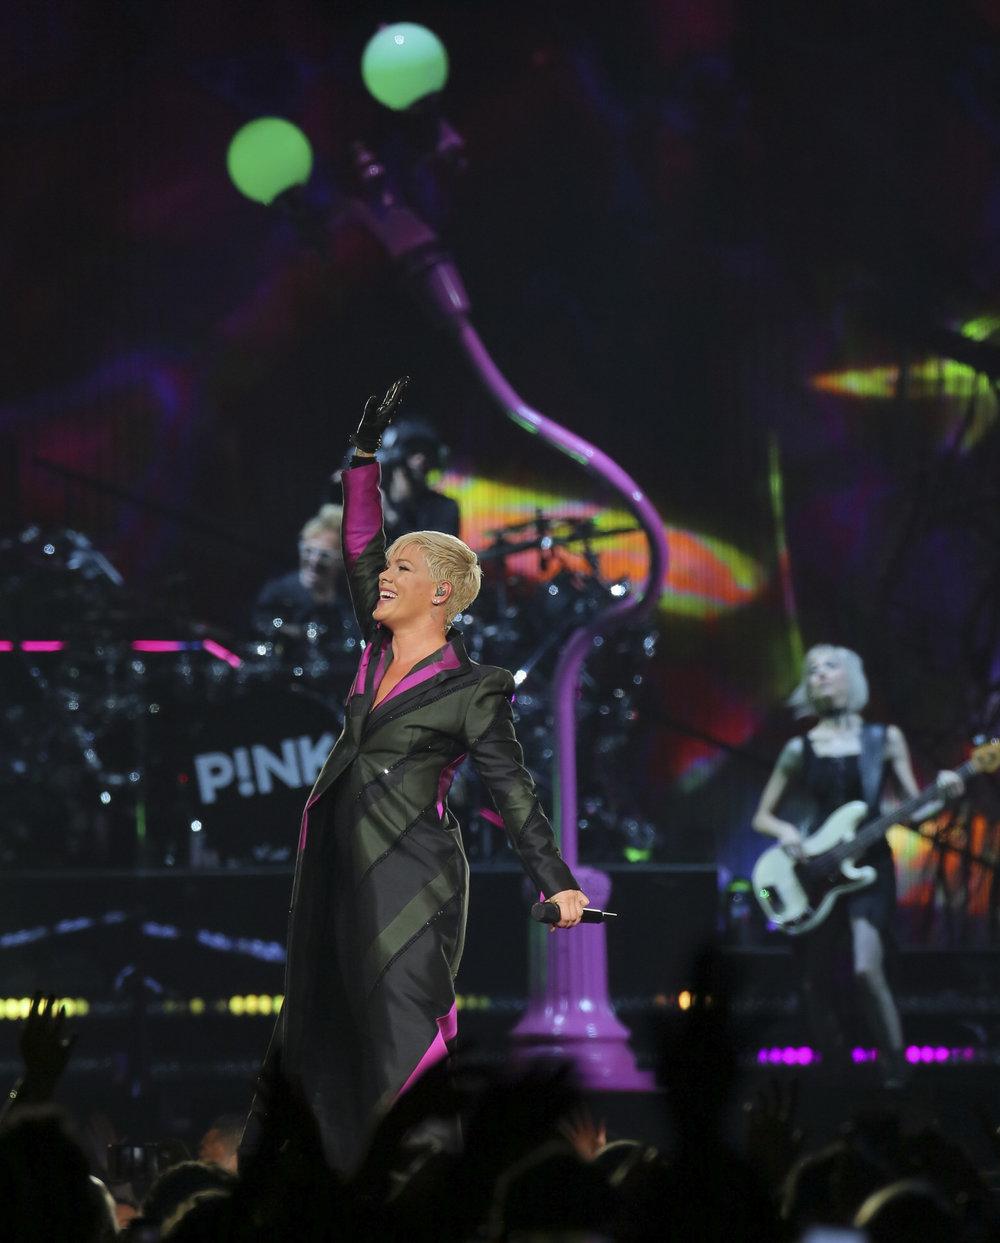 PINK LIVE FROM JPG_13.JPG